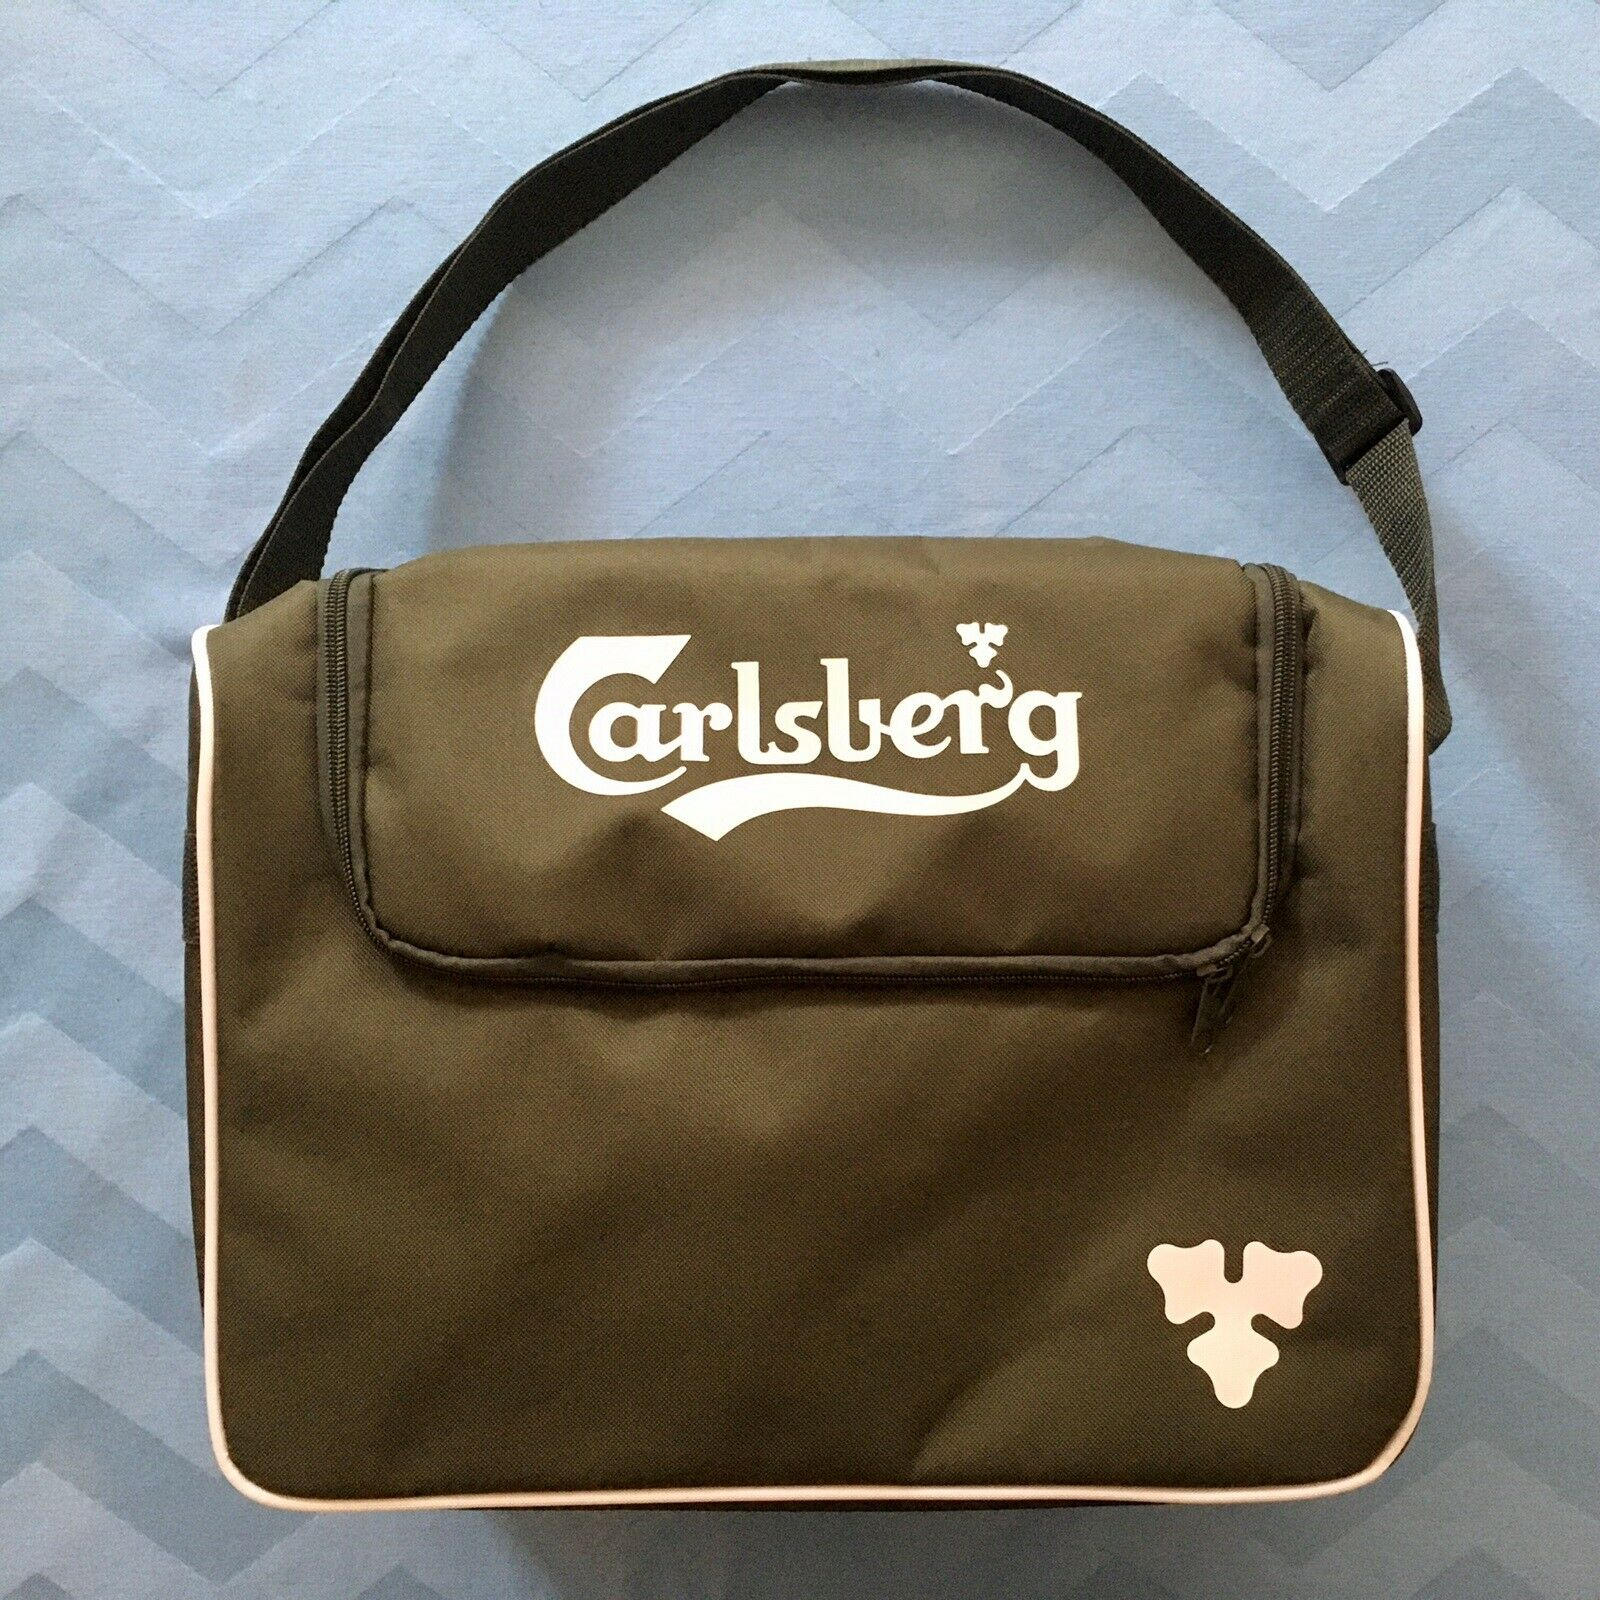 Anden taske, Carlsberg